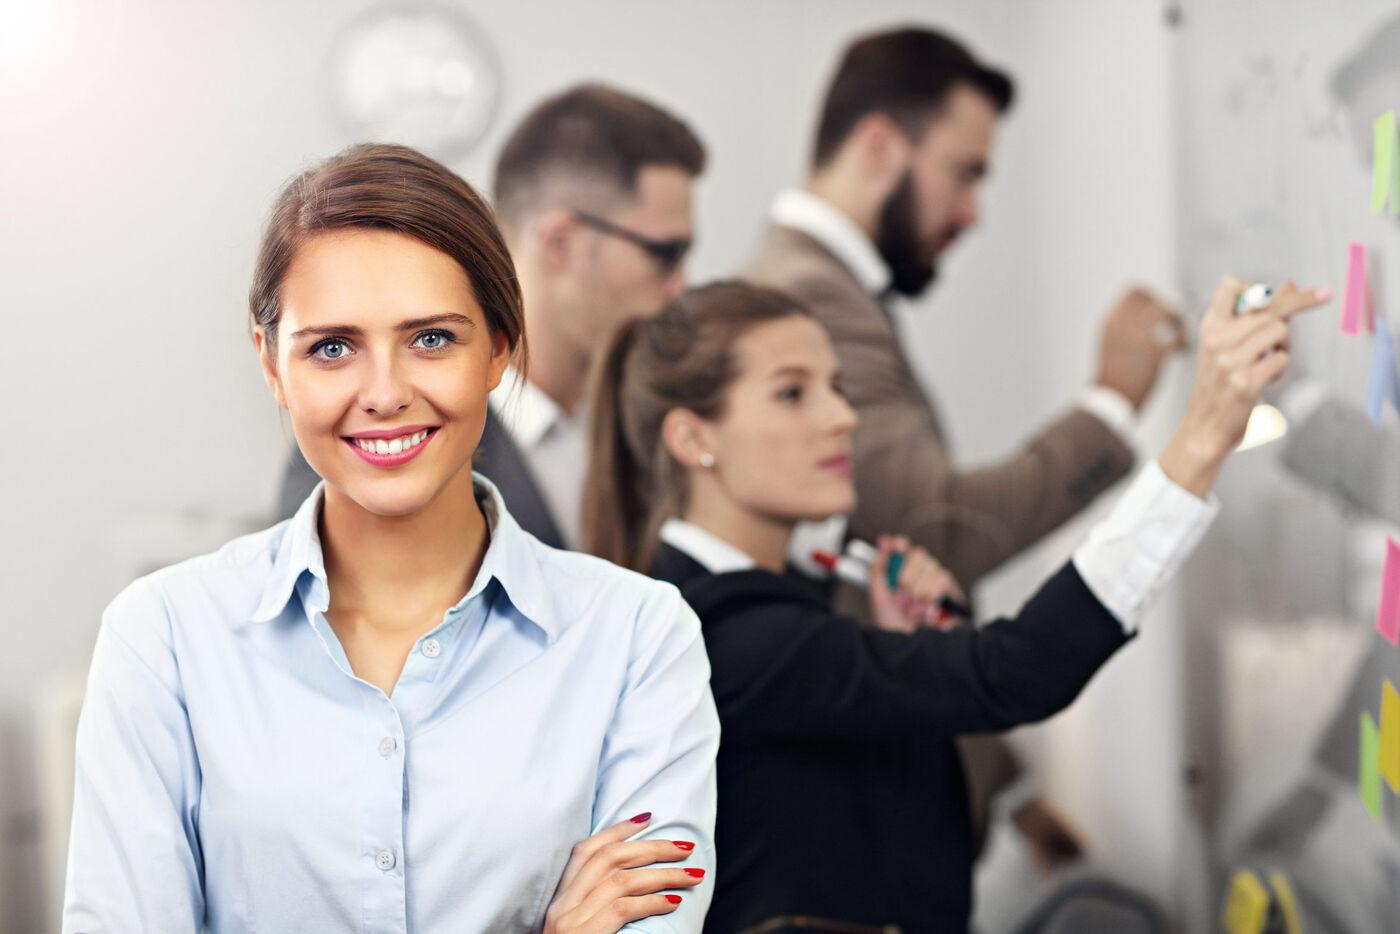 Finanzbuchhalter (m/w/d) - Job Koblenz - Karriereportal der Gruppe Dr. Dienst & Partner - Post offer form